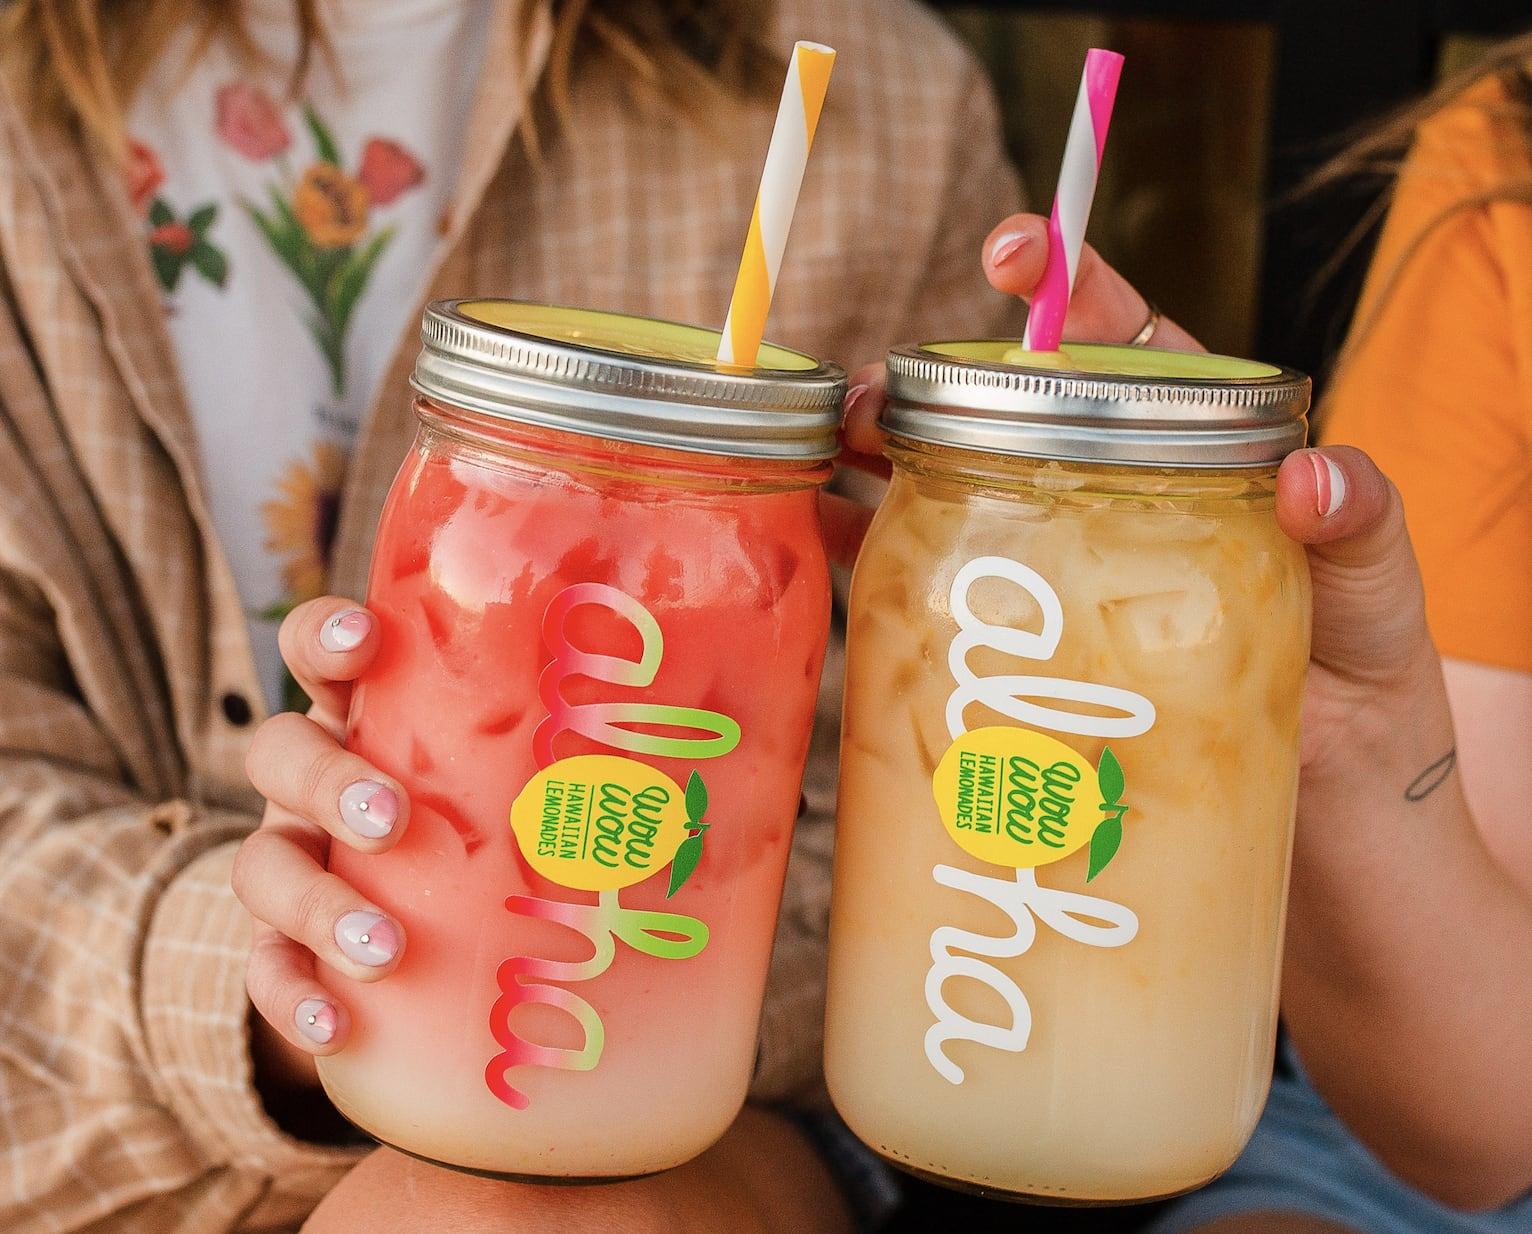 Drinks in Aloha glasses